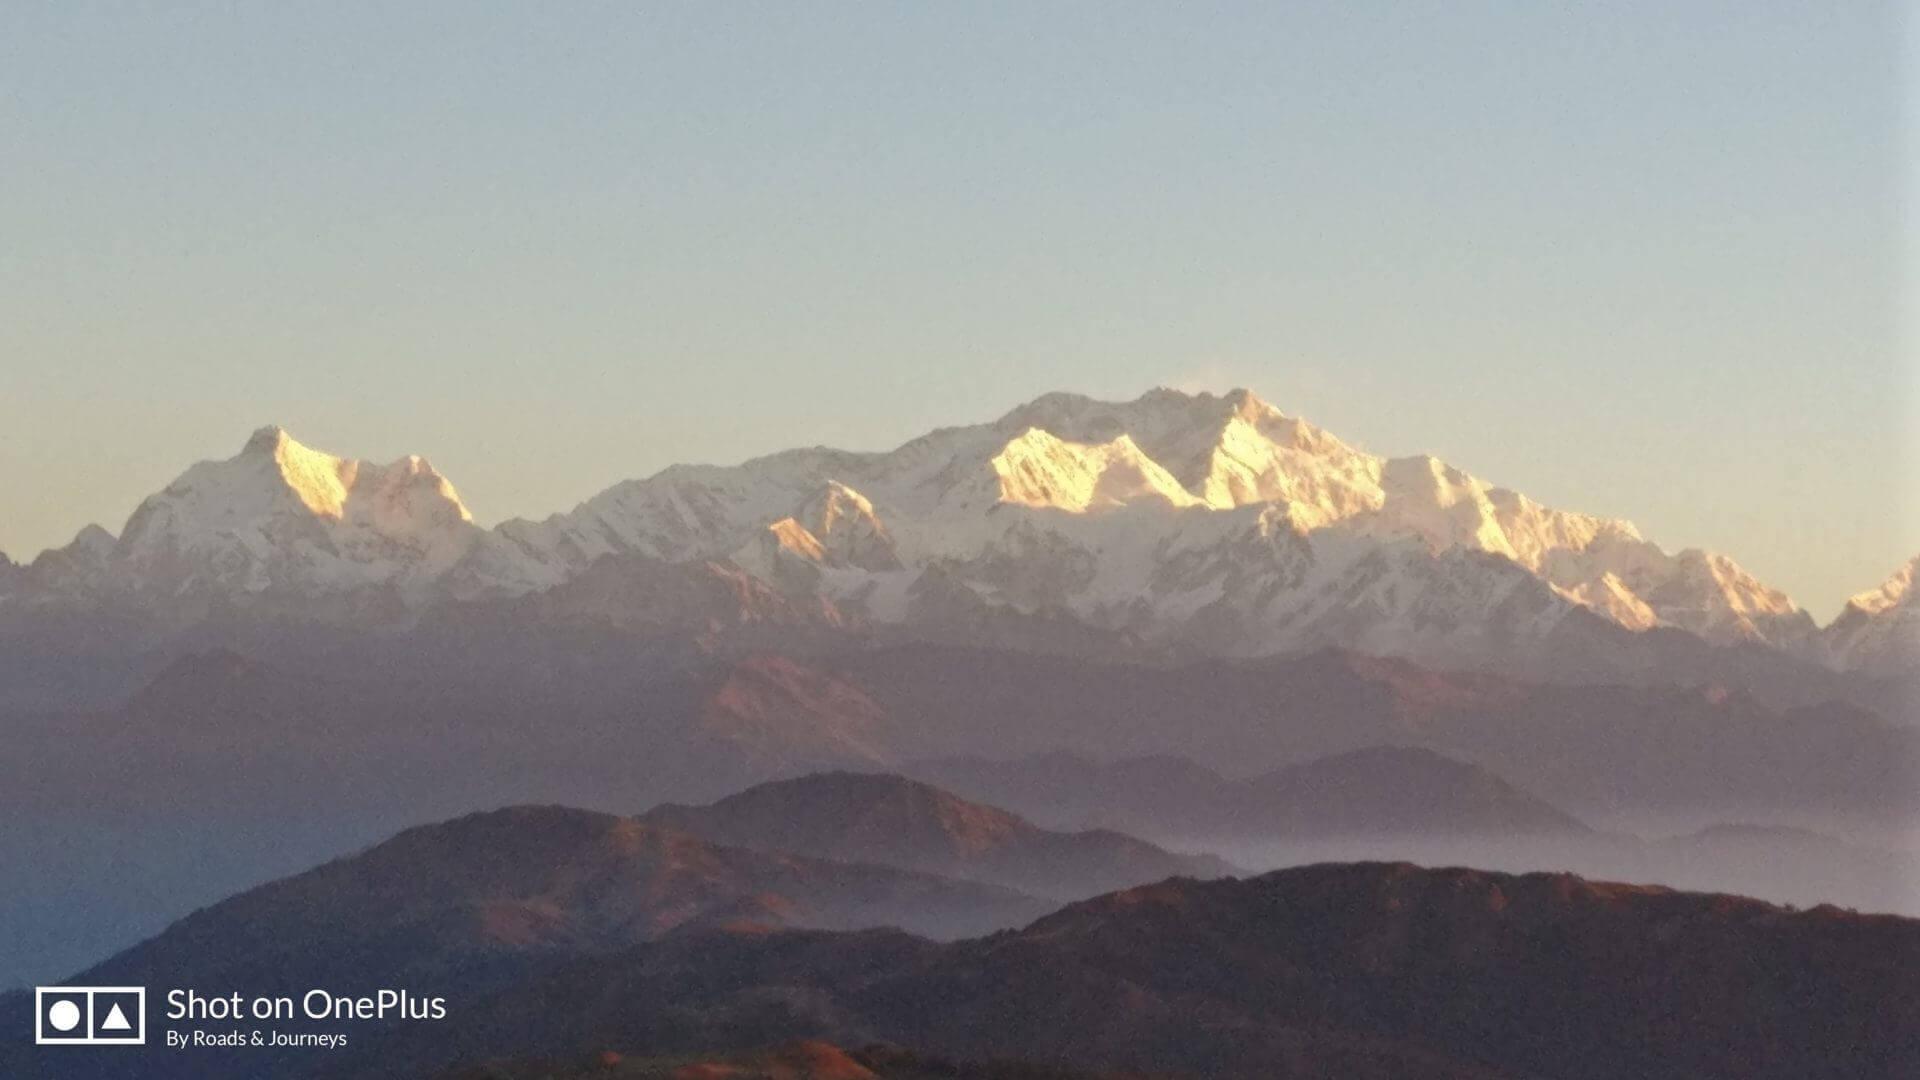 Bagdogra, Kanchenjunga, Sandakphu